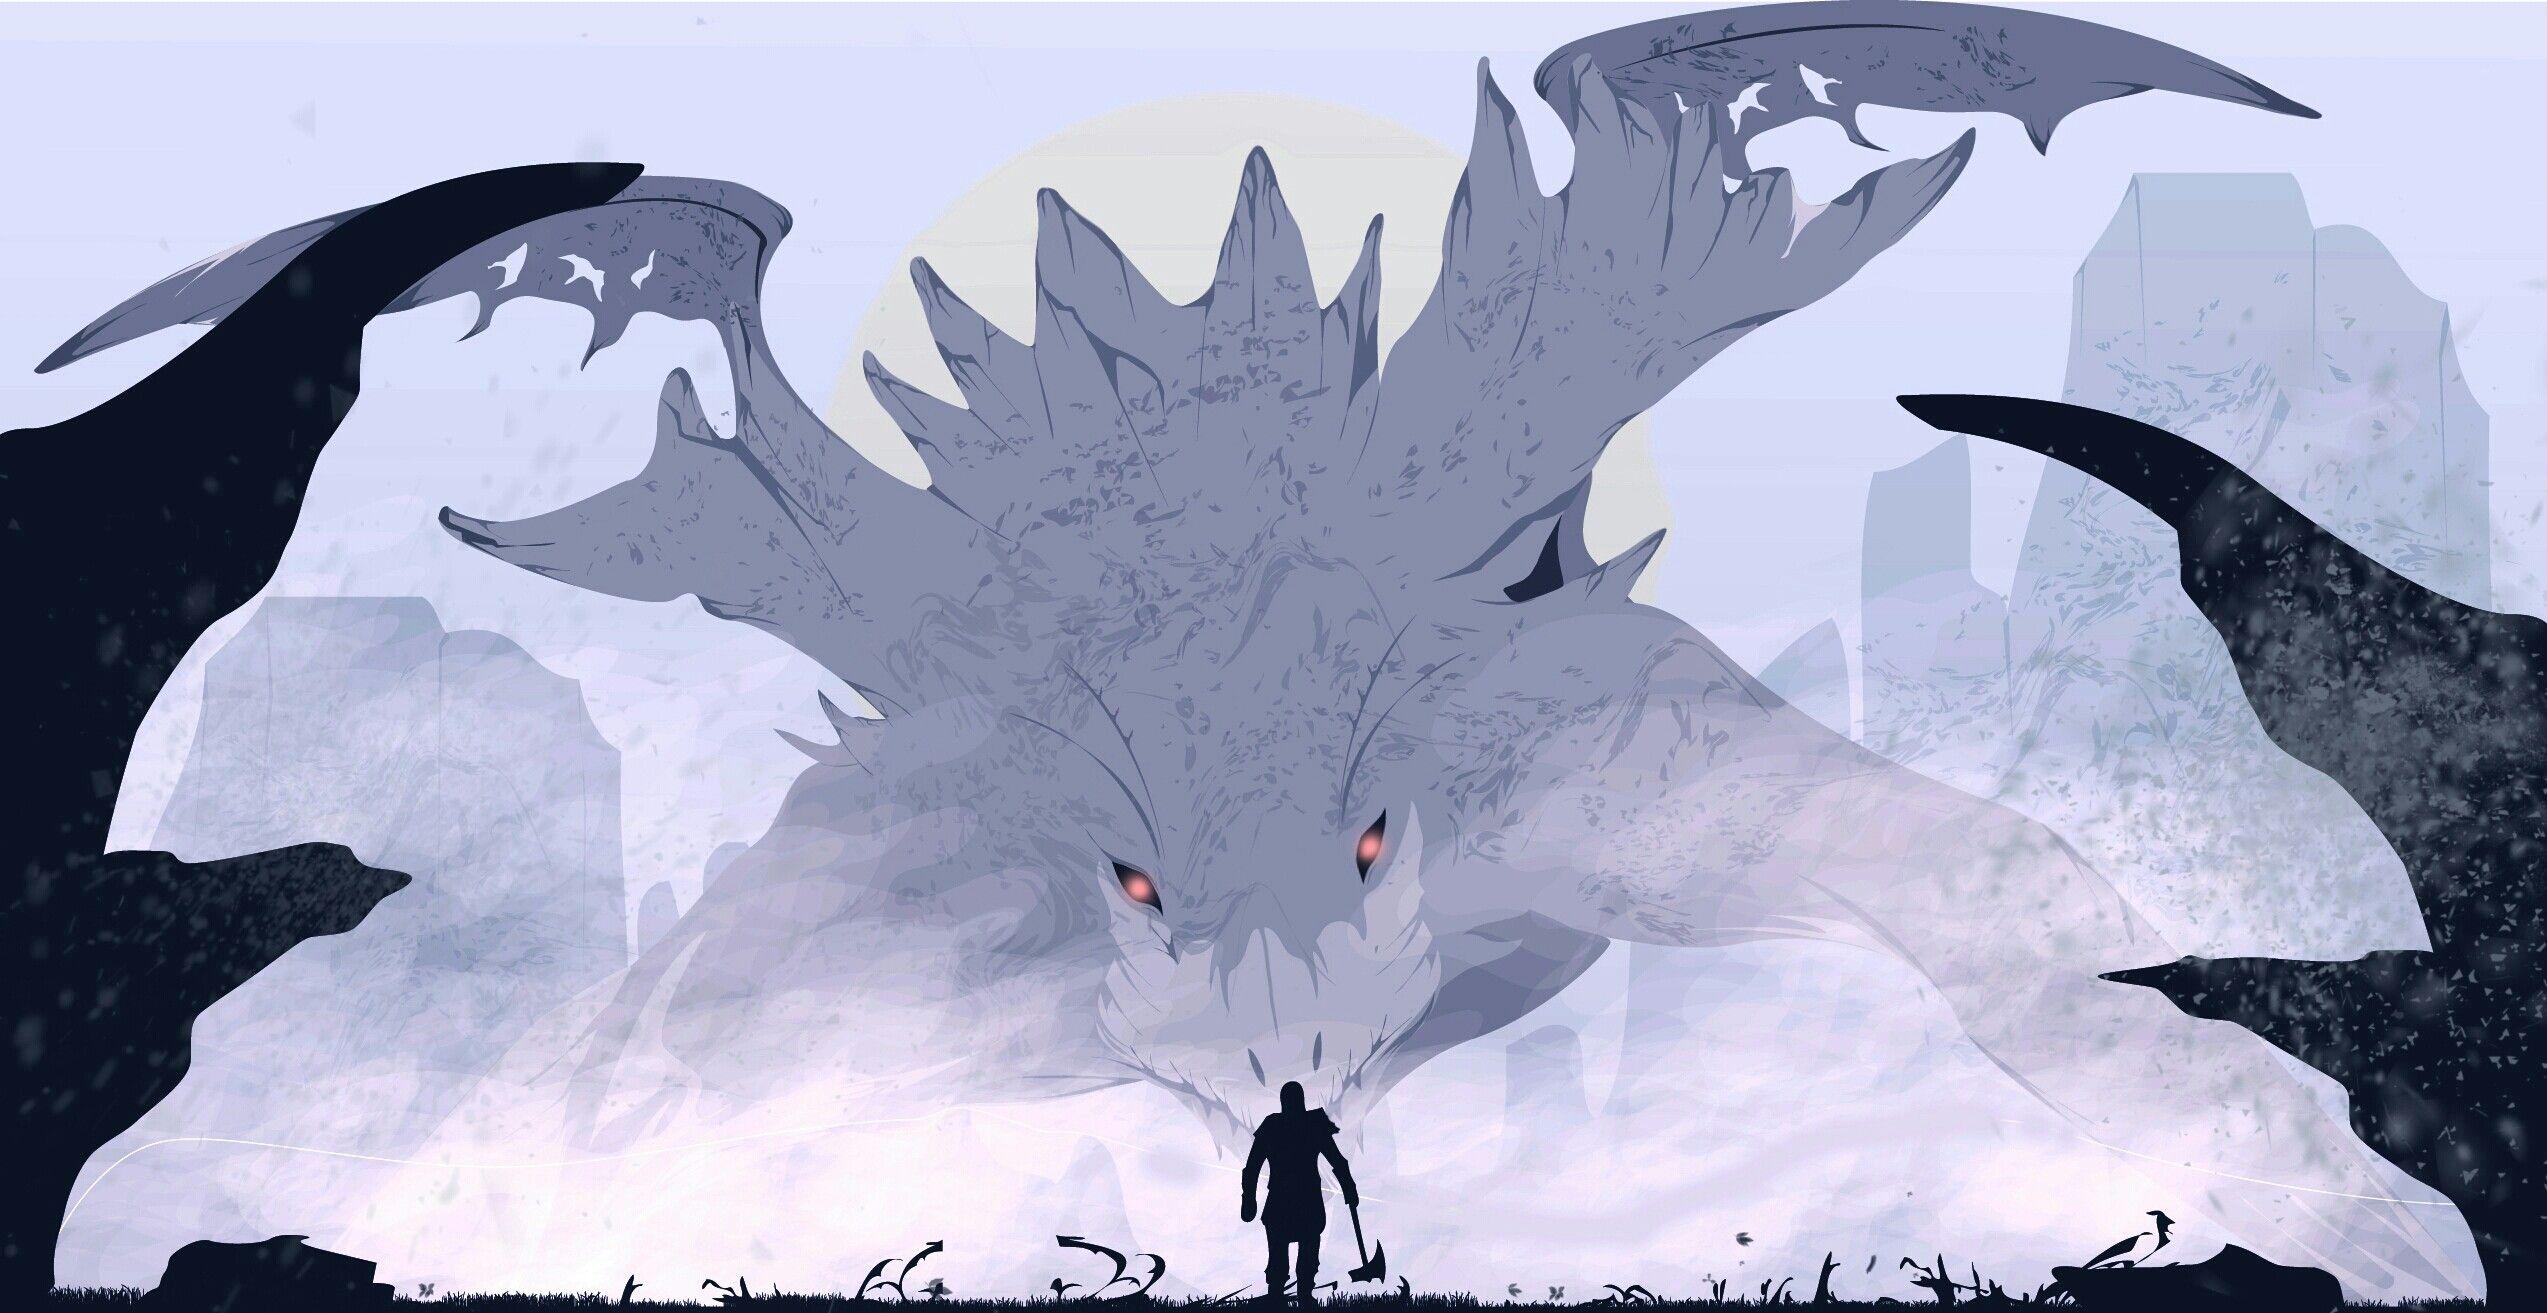 Free Download Pin By Jon Barajas On Dragons Dragonkin In